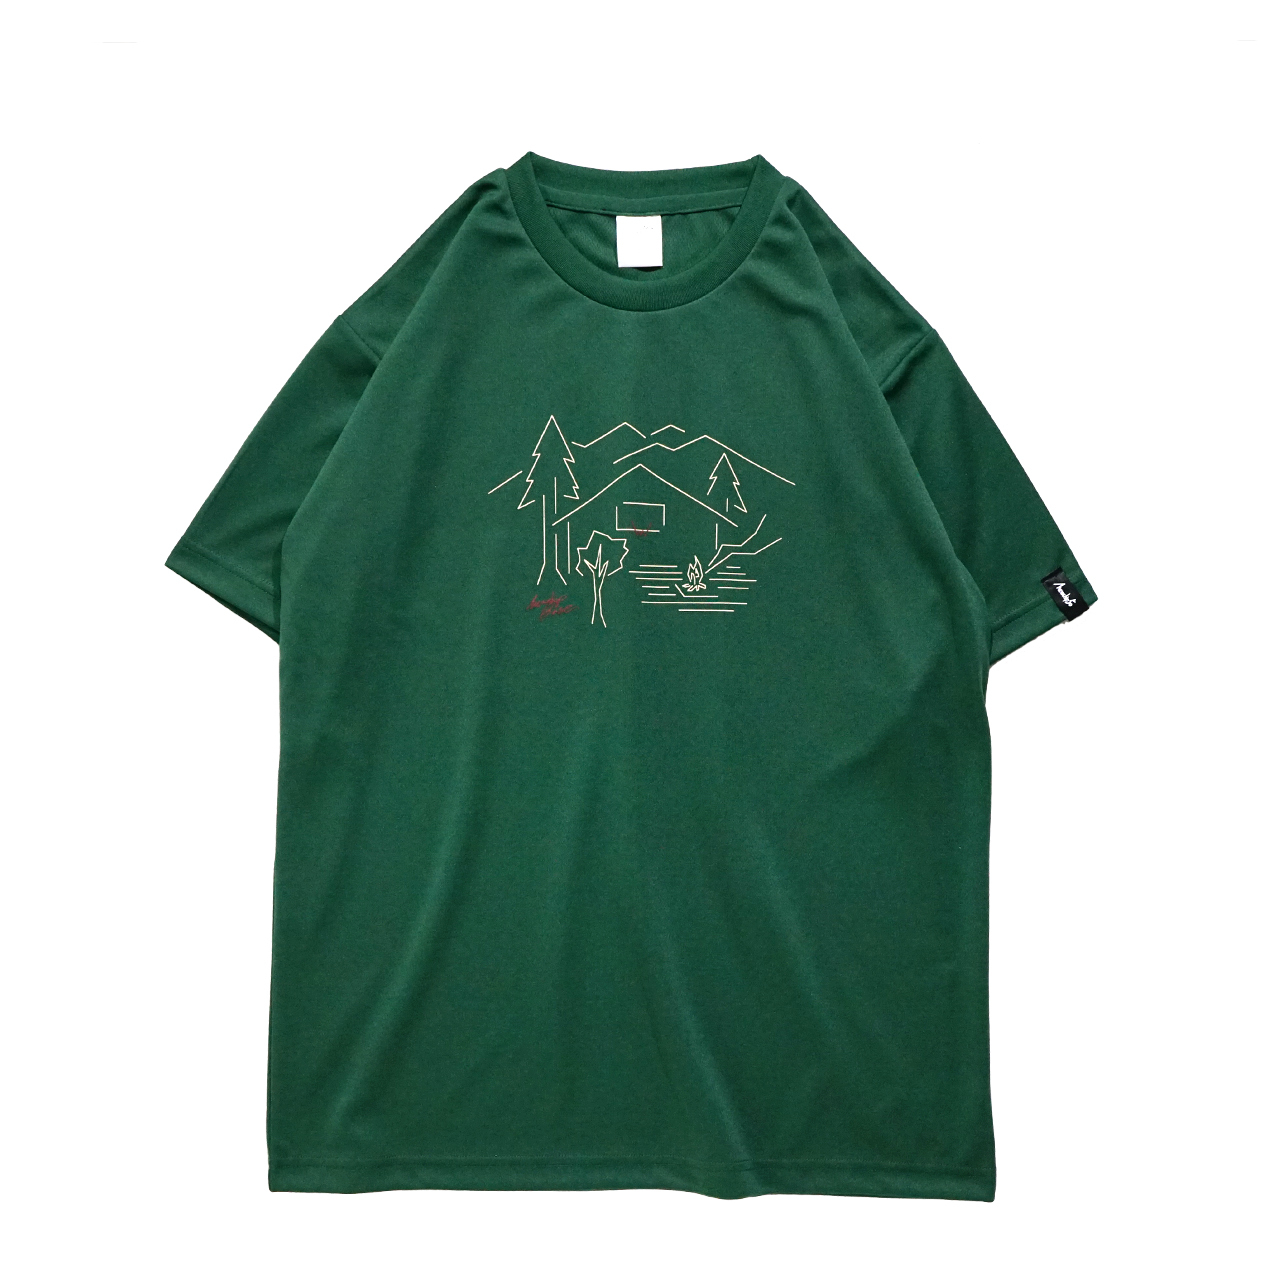 MEWSHIP BASE S/S PL <A.Green×Beige×Burgundy> - 画像1